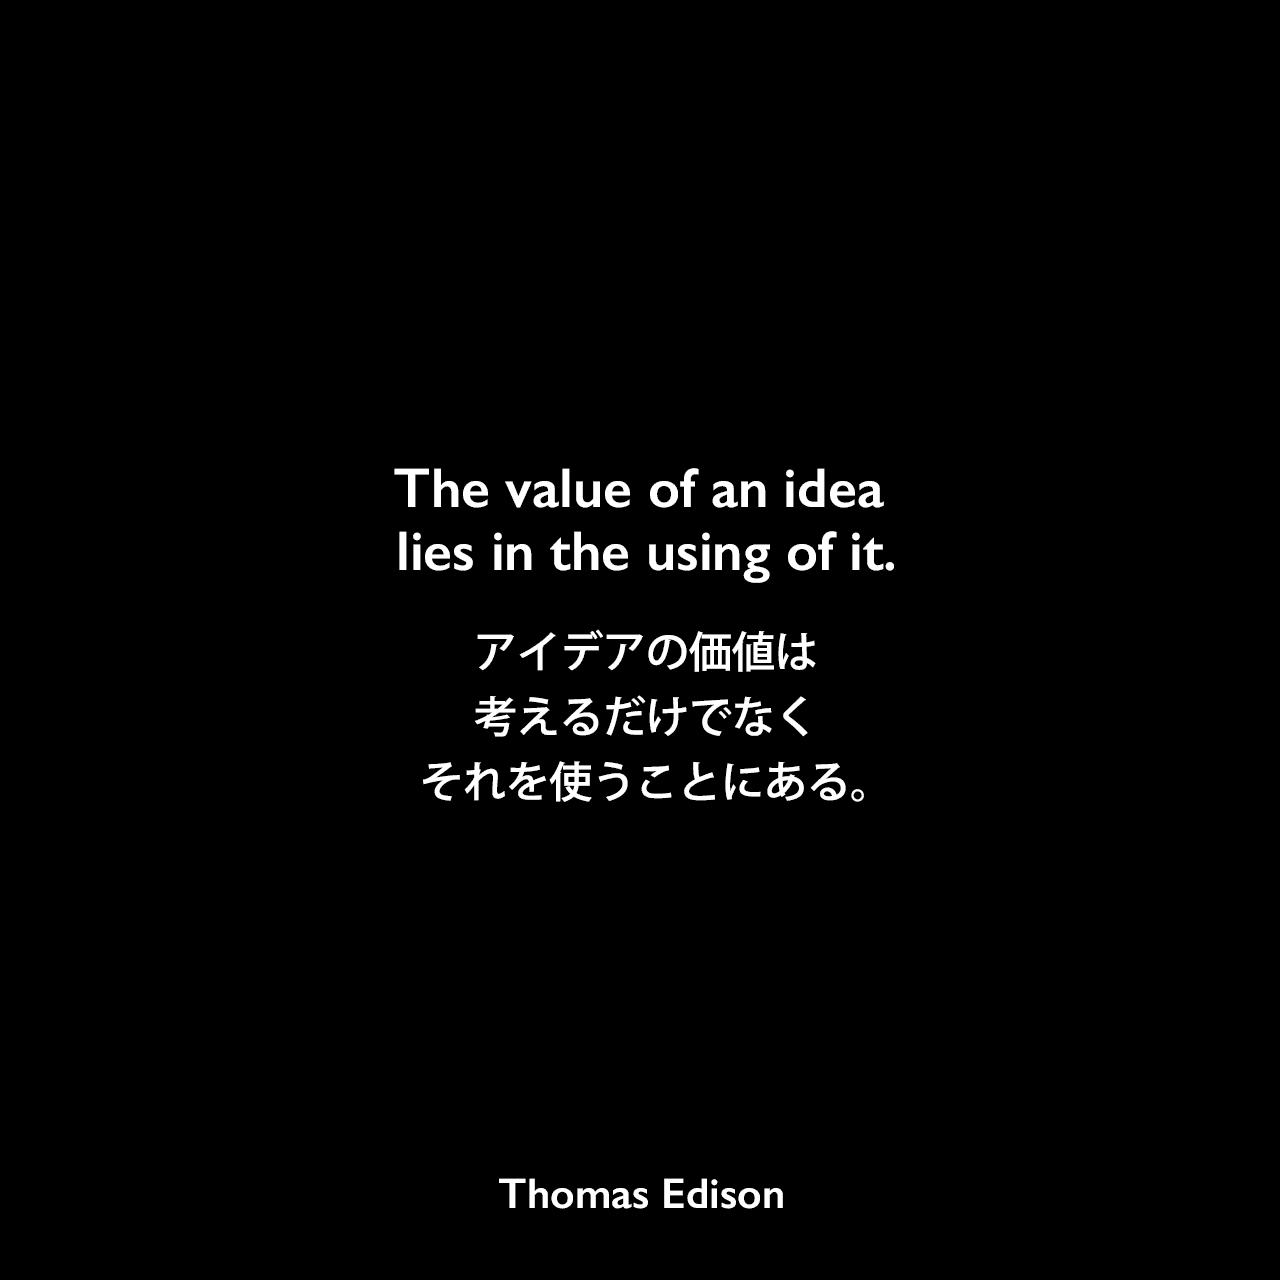 The value of an idea lies in the using of it.アイデアの価値は、考えるだけでなく、それを使うことにある。Thomas Edison